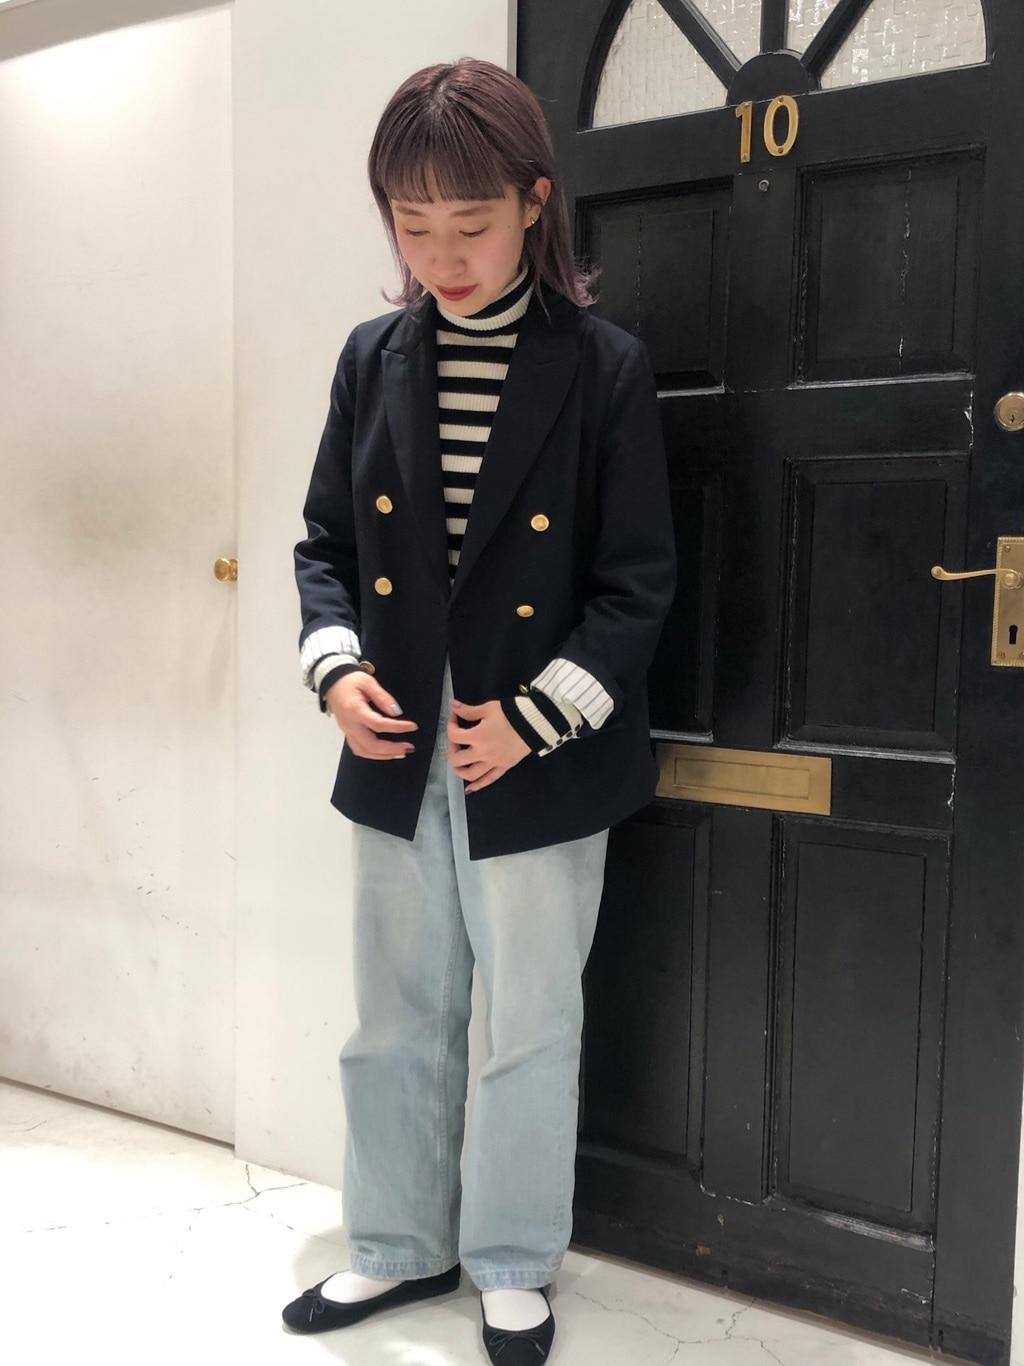 Dot and Stripes CHILD WOMAN ルクアイーレ 身長:157cm 2020.11.25